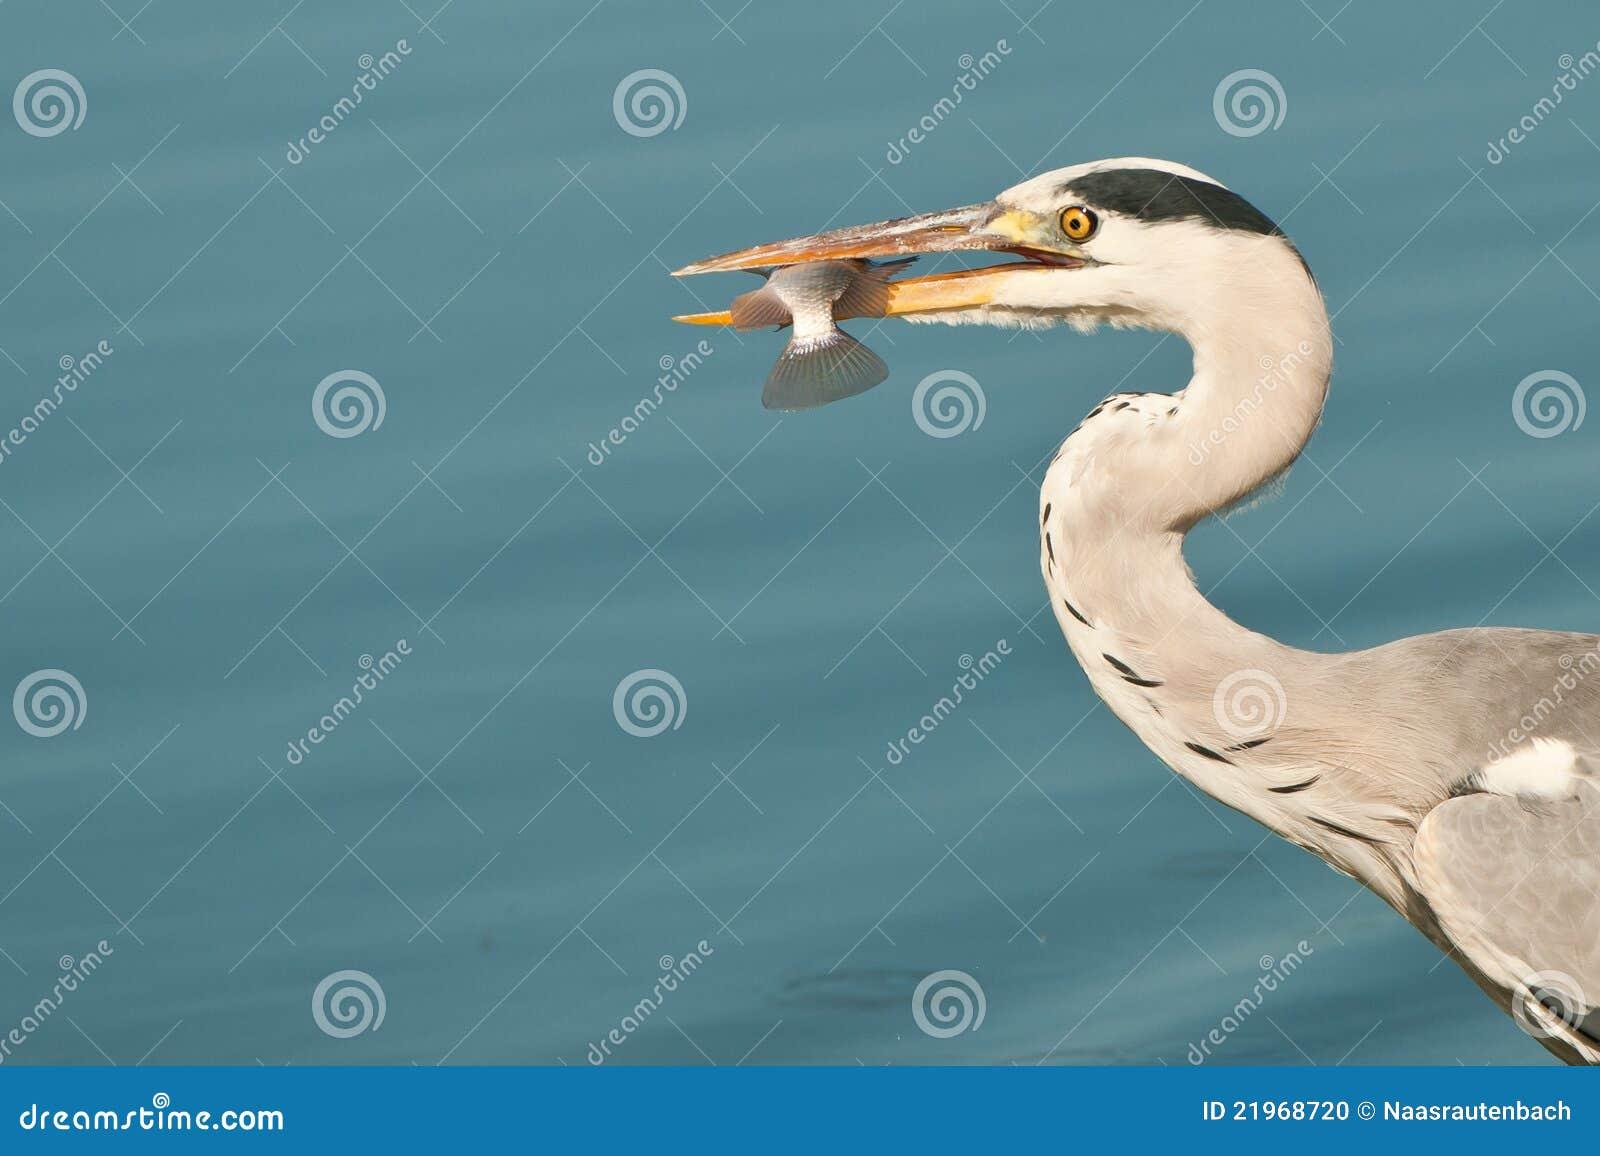 Grey heron eating a fish stock photo image 21968720 for Dreaming of eating fish